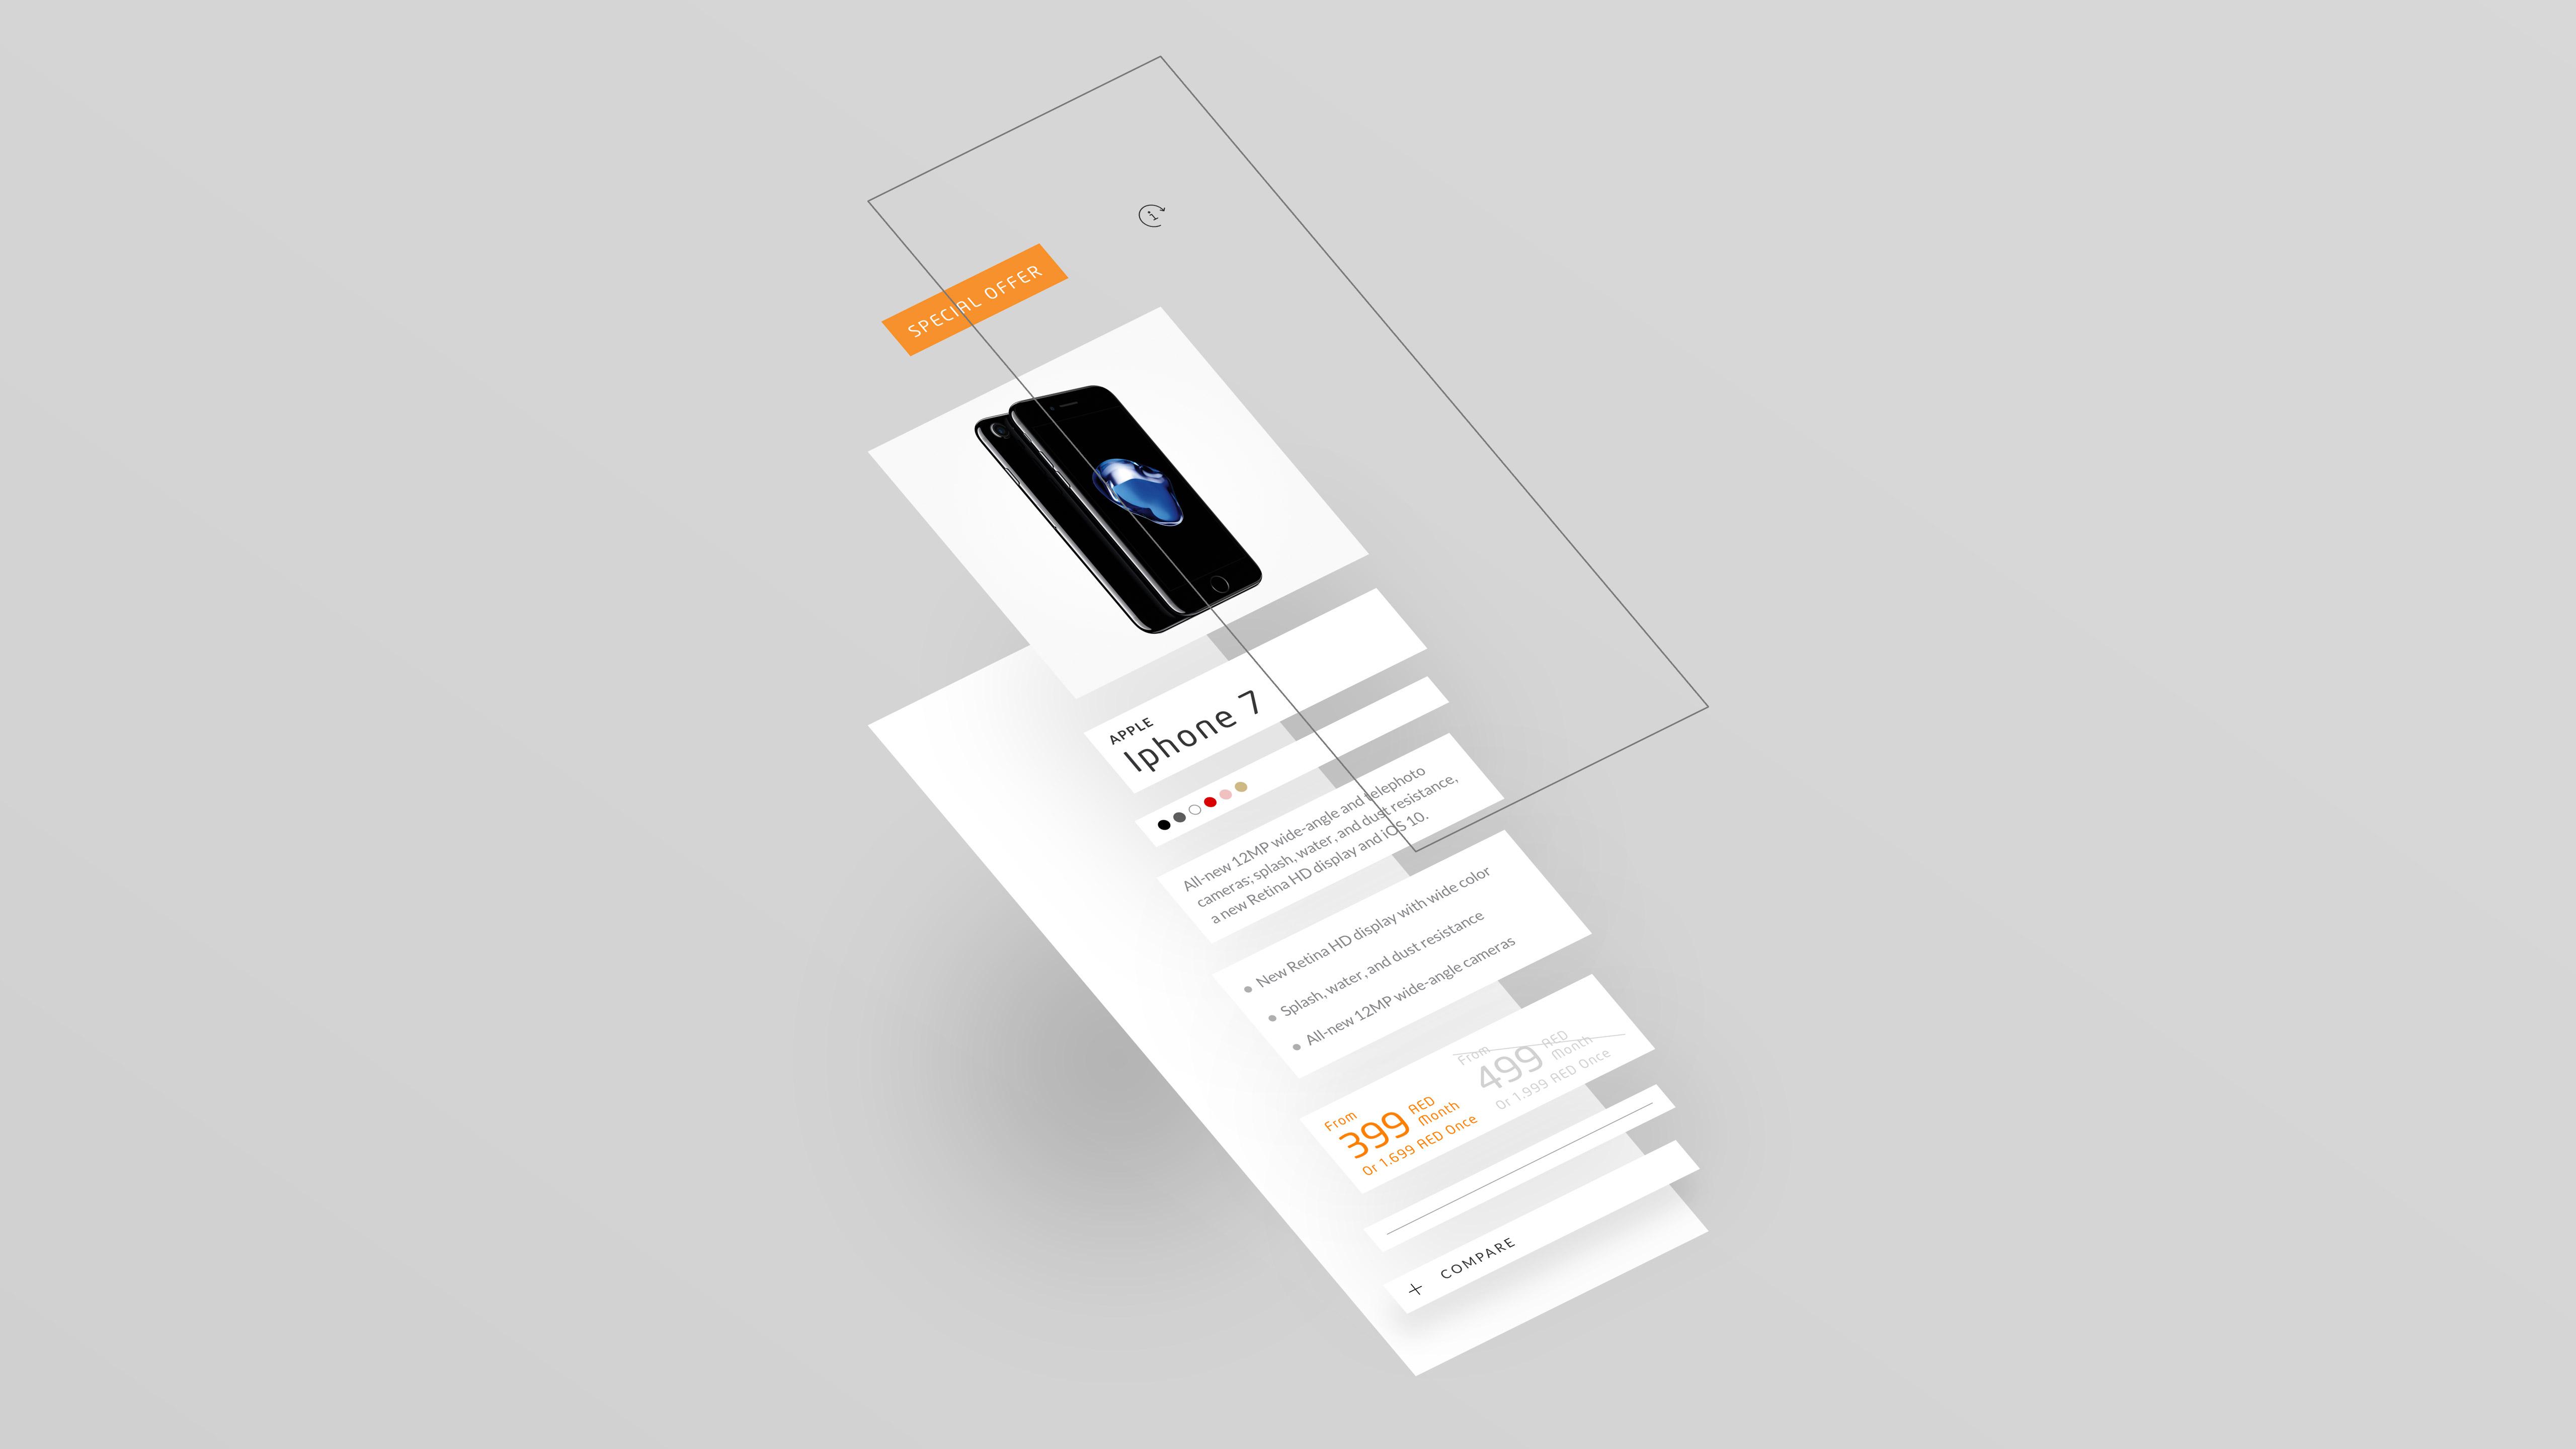 etisalat_design_system_022